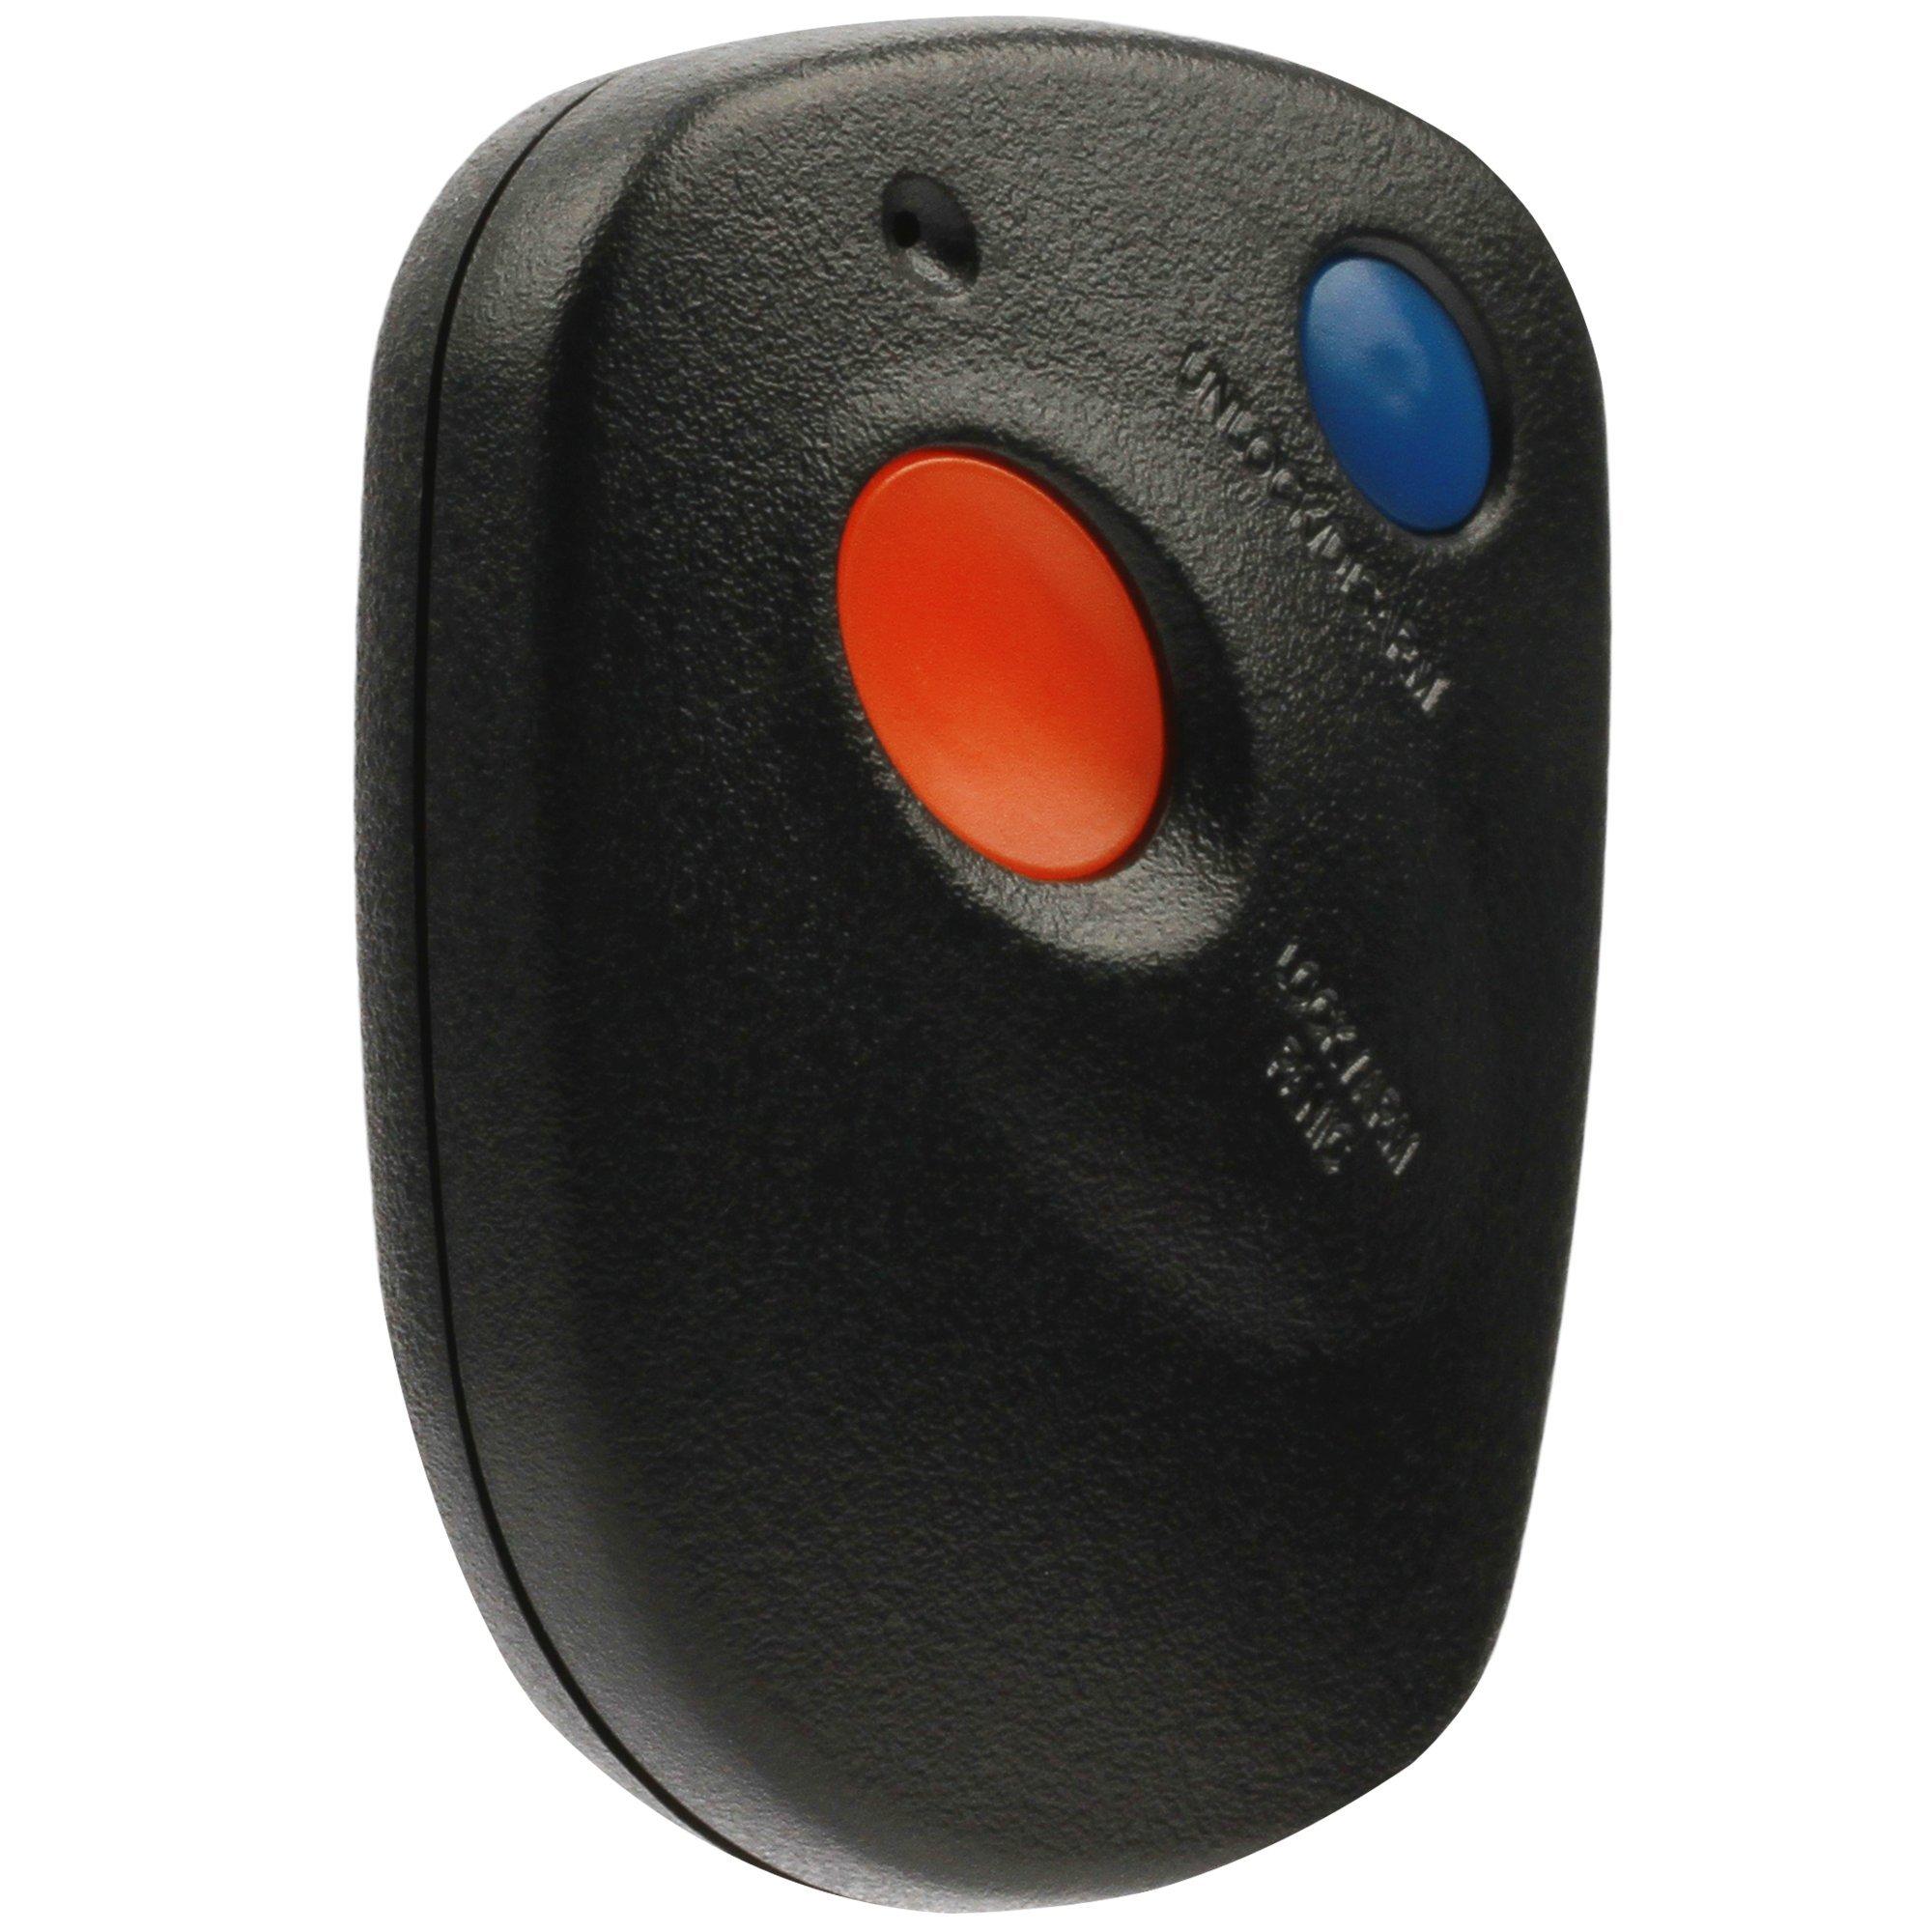 Car Key Fob Keyless Entry Remote fits 2003-2006 Subaru Baja / 2001-2004 Forester / 2000-2004 Impreza / 1999-2004 Legacy / 2000-2004 Outback (A269ZUA111)